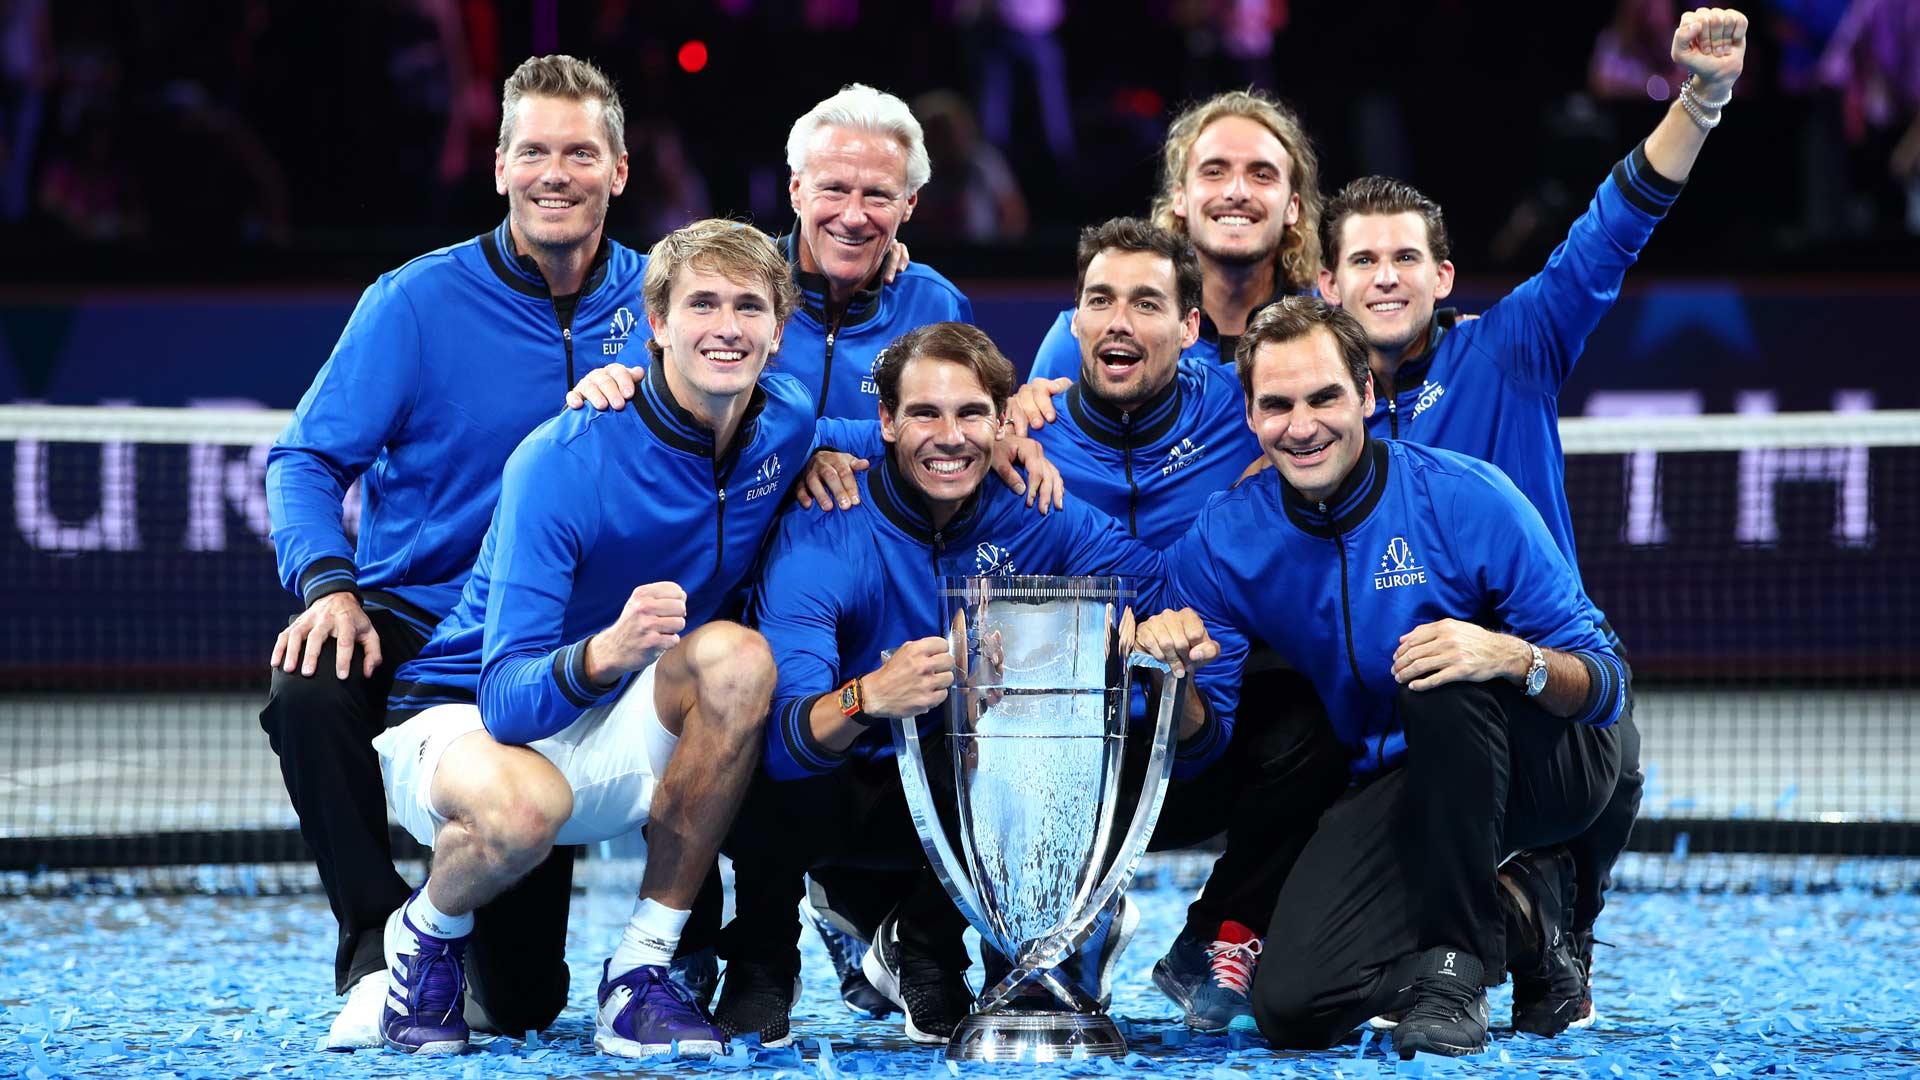 تنیس-لیورکاپ-Tennis-Laver Cup